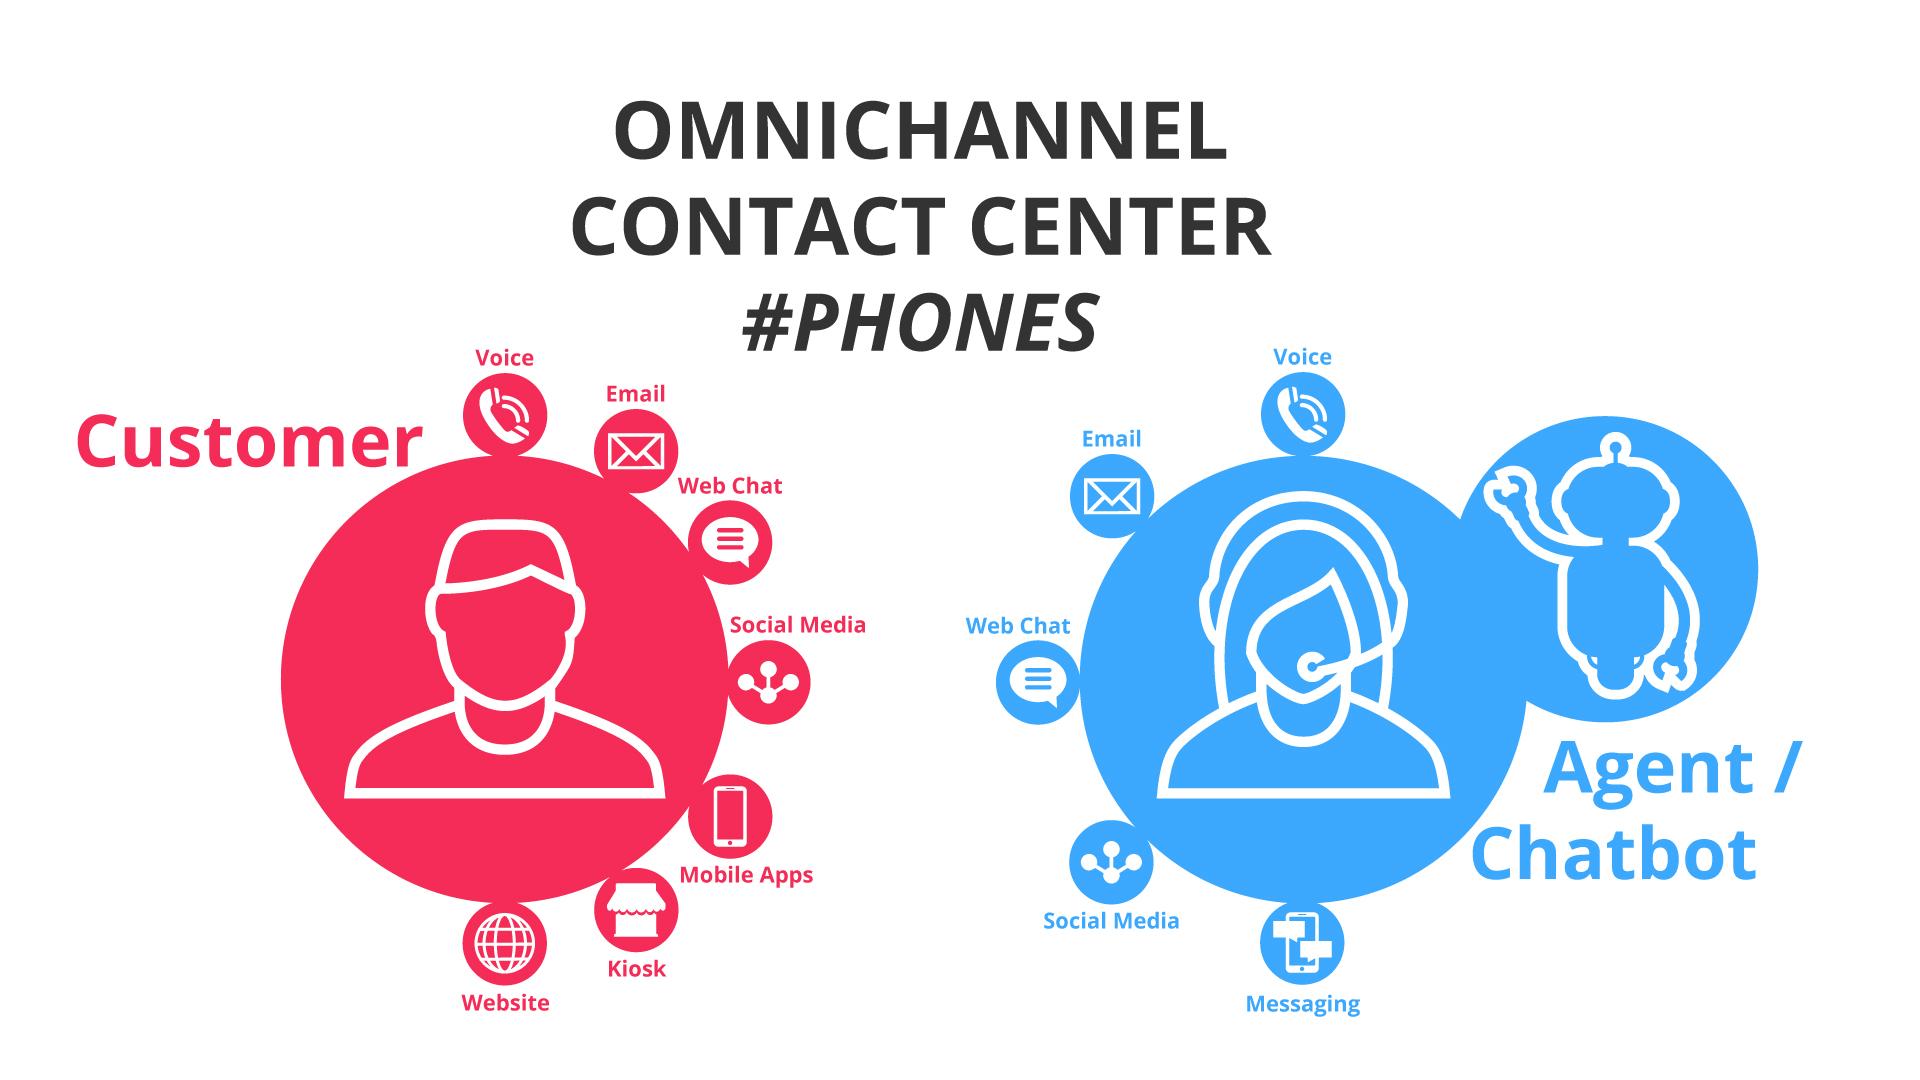 img_Assicurare-la-customer-satisfaction-con-#phones